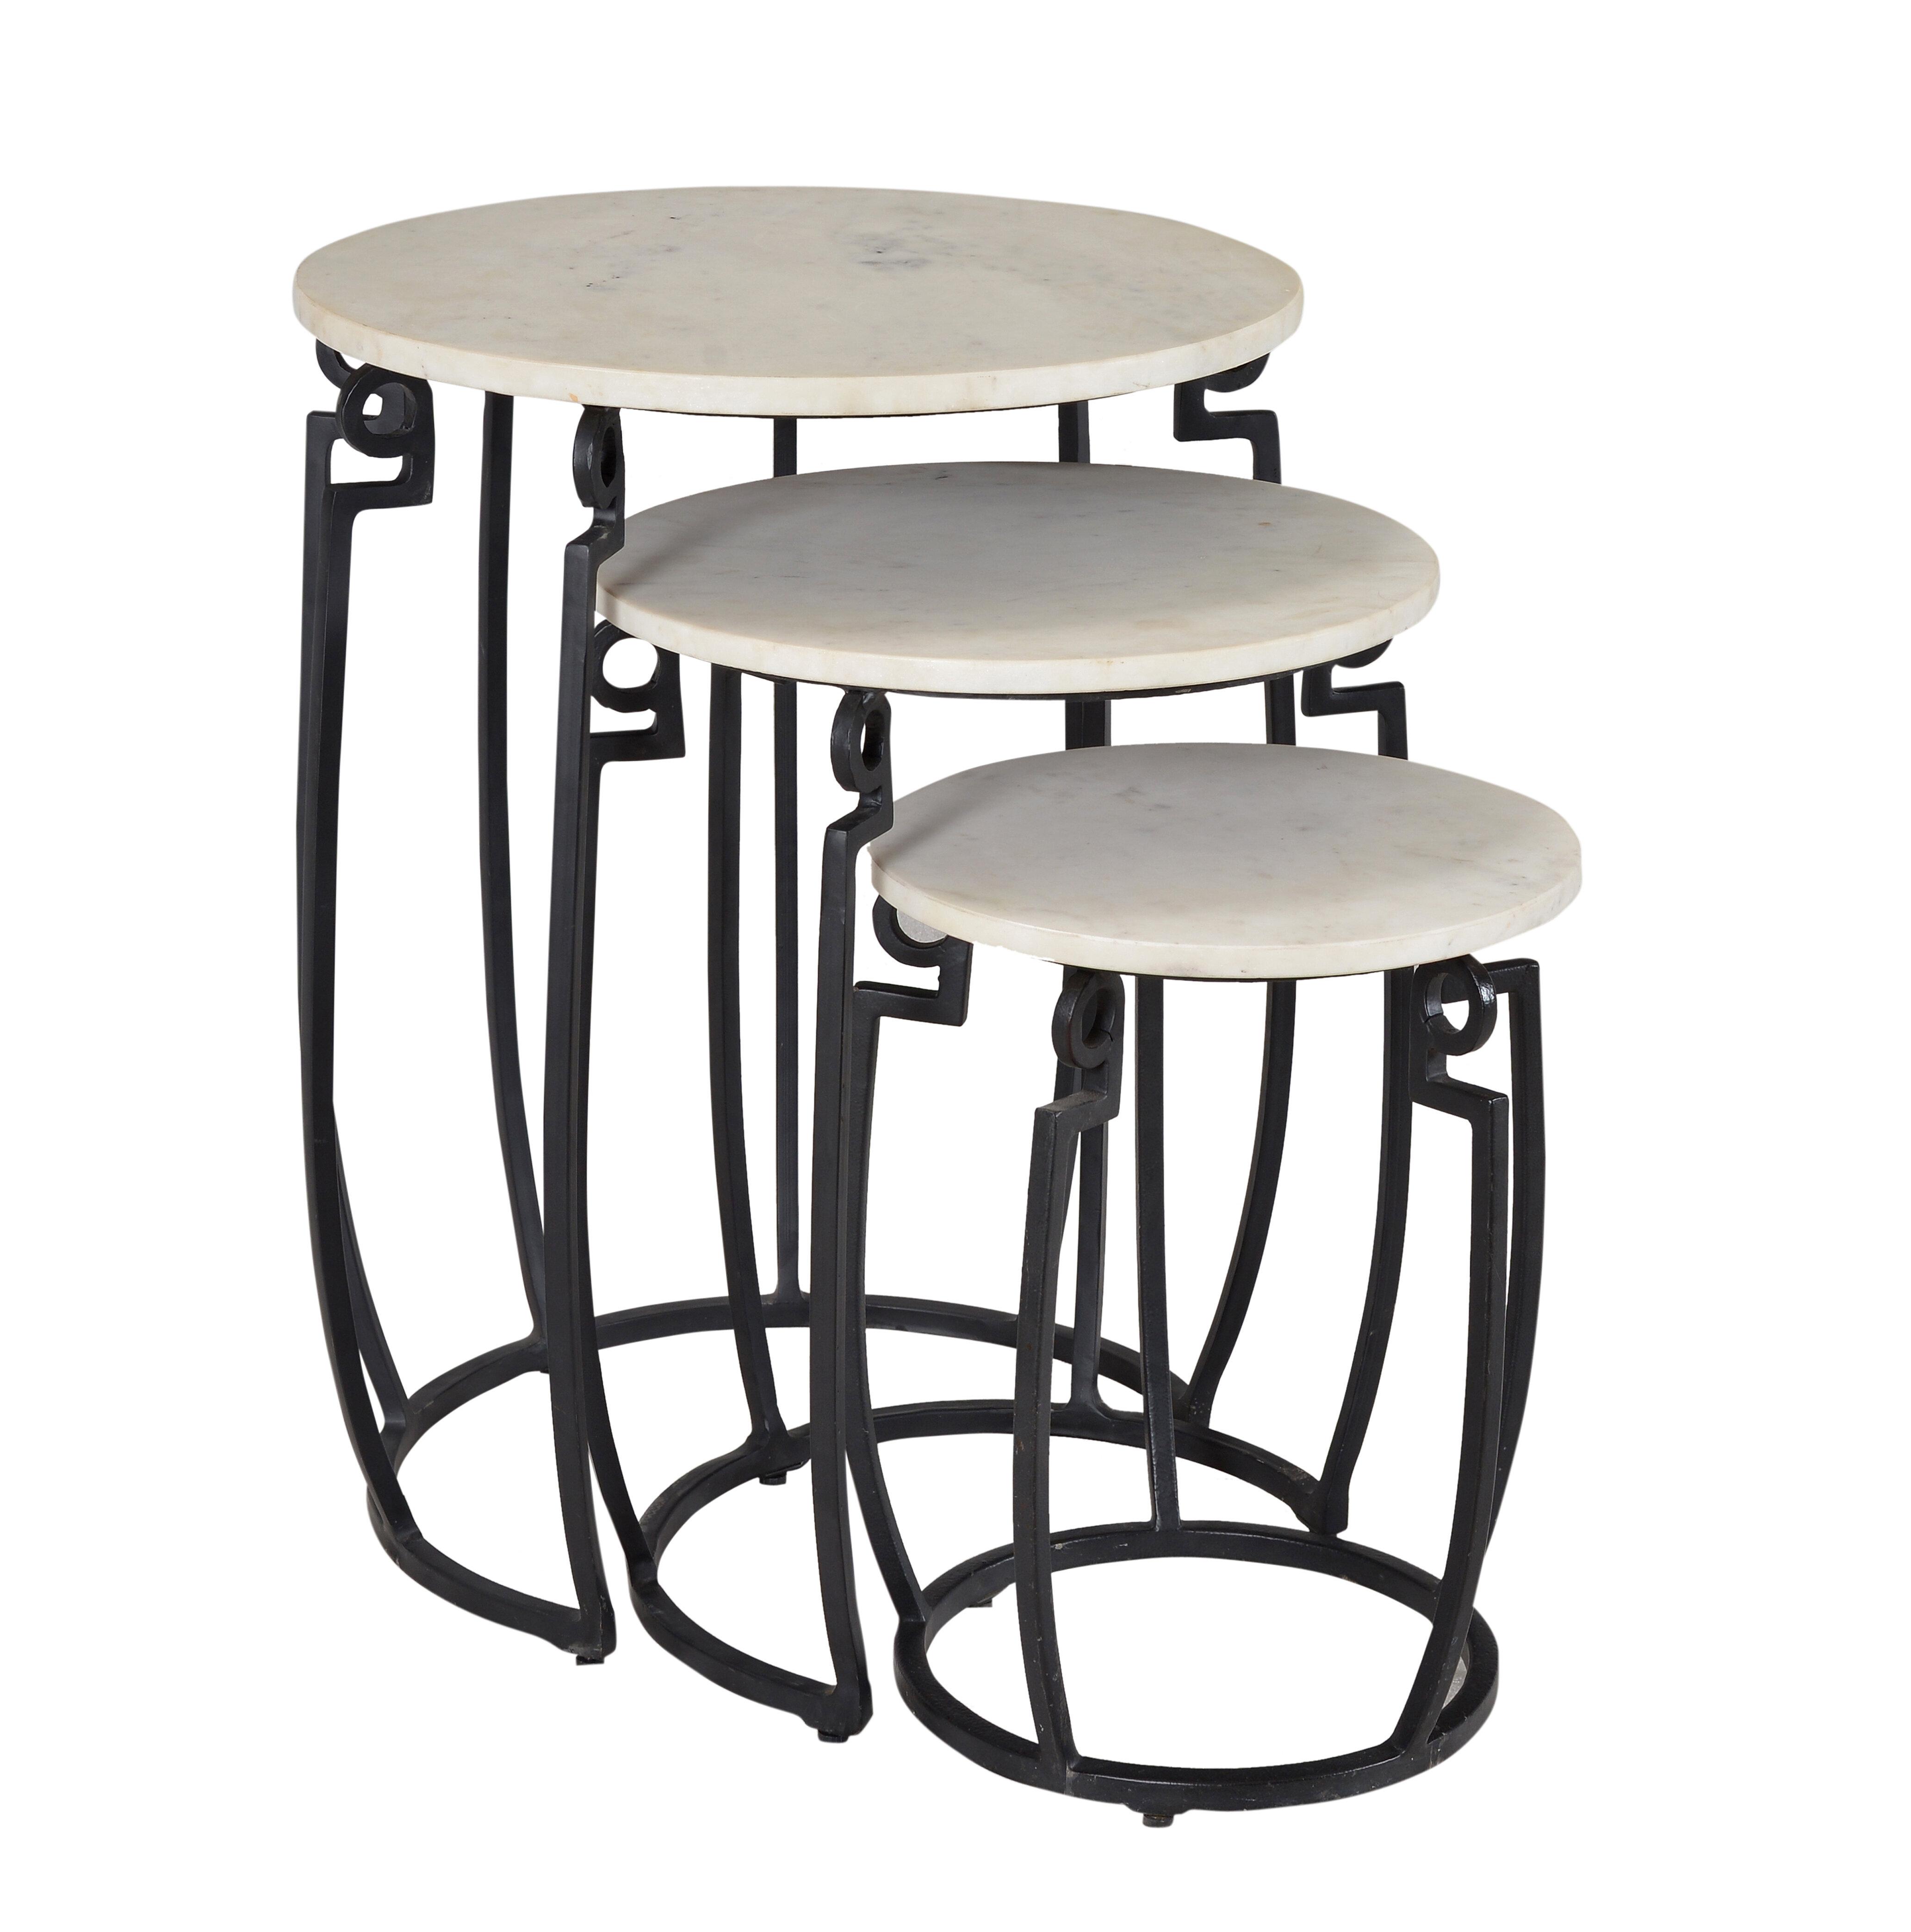 Latitude Run Shilin 3 Piece Nesting Tables Reviews Wayfair